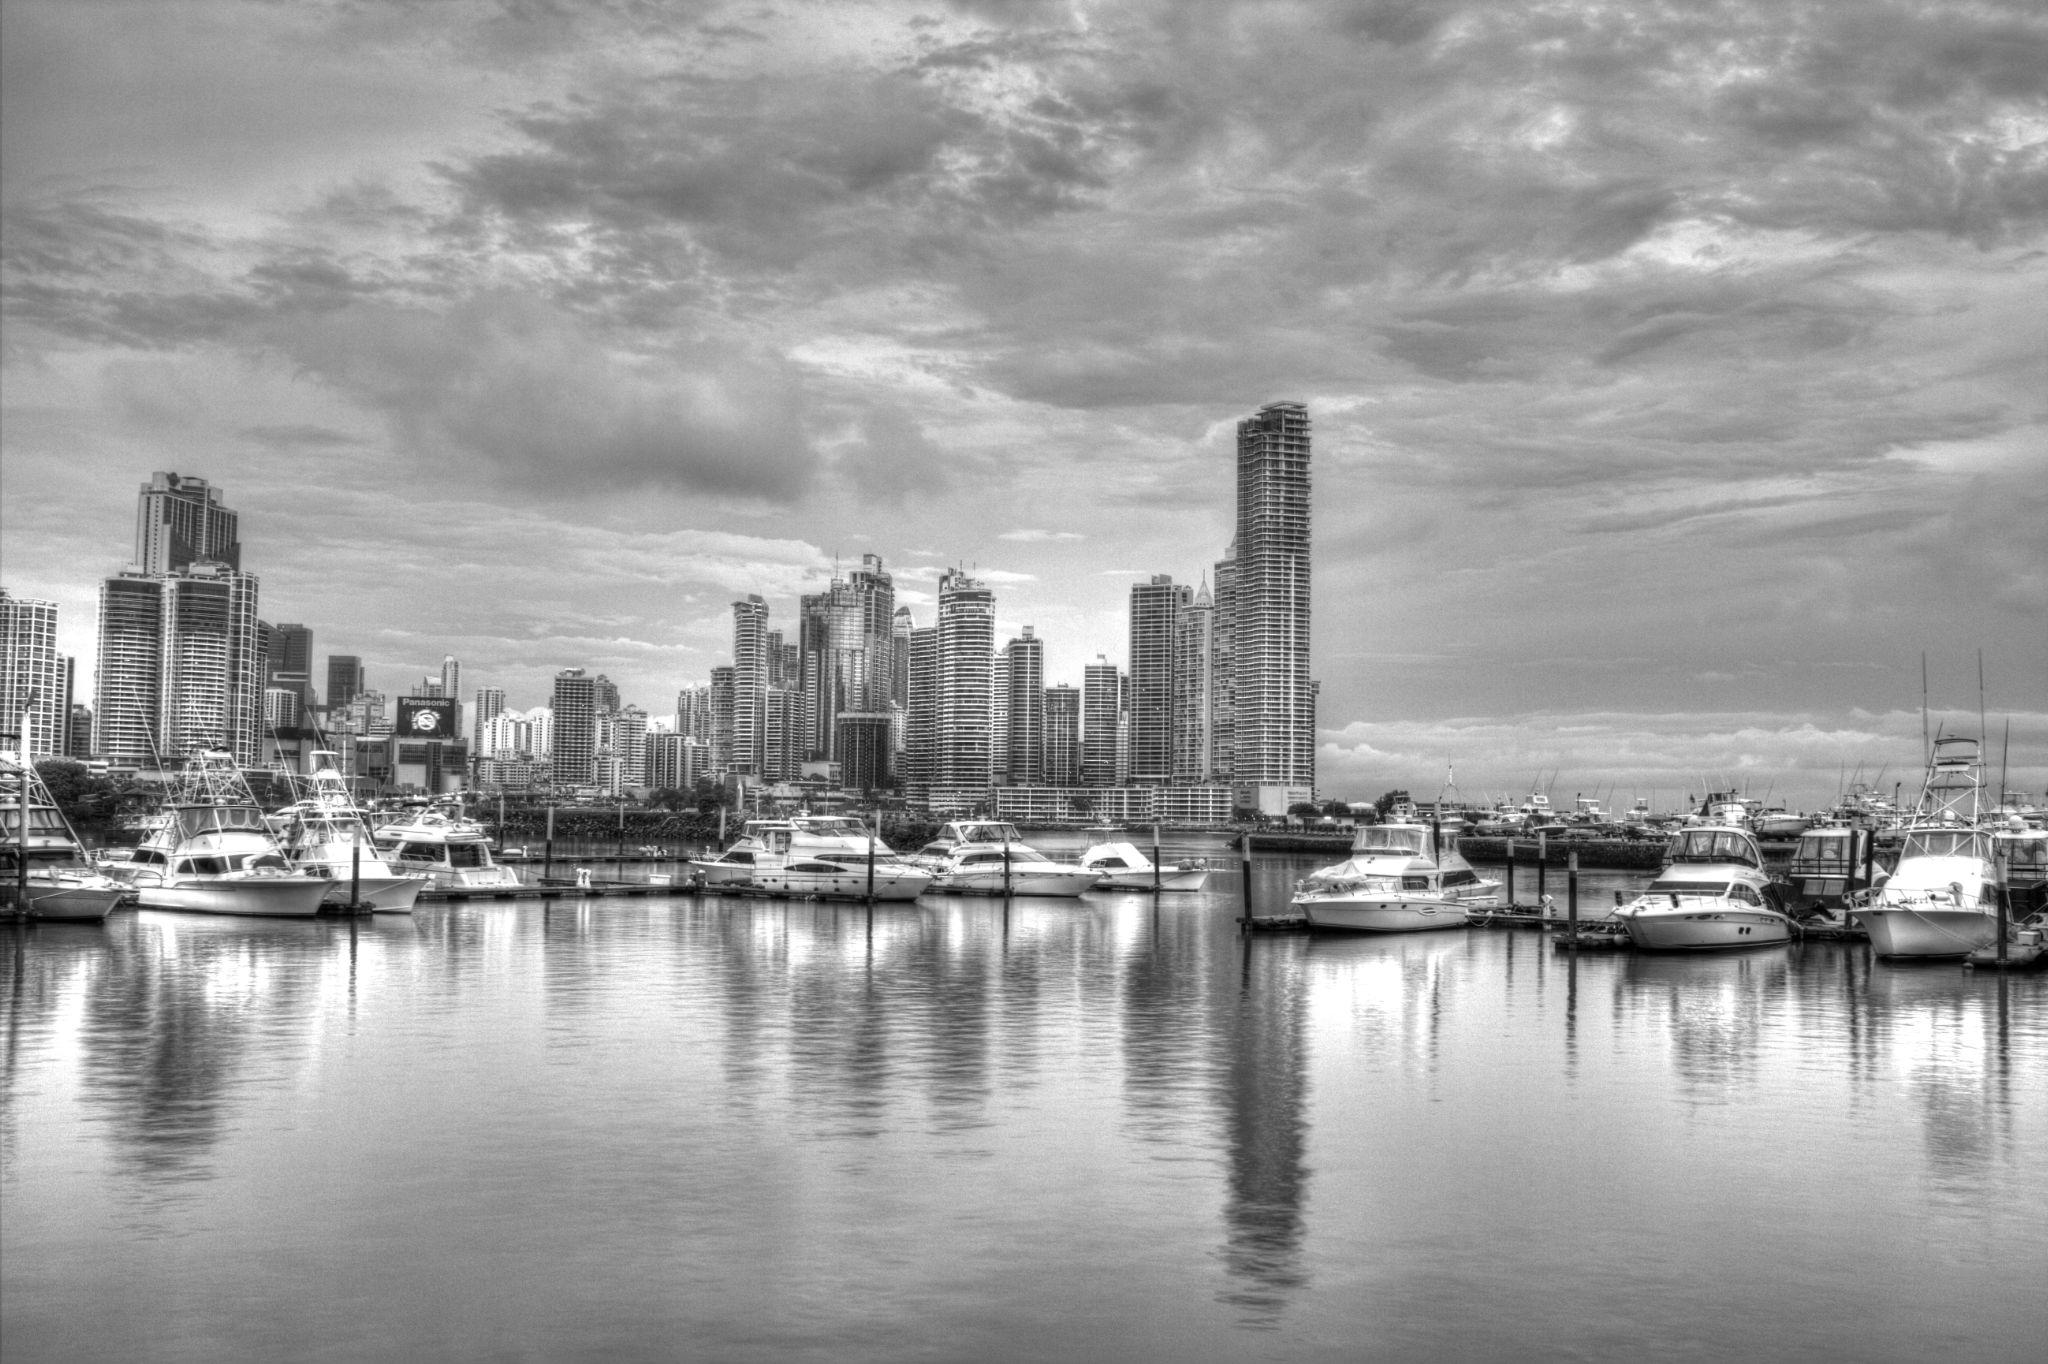 Yachts in the bay by DavidJPhoto